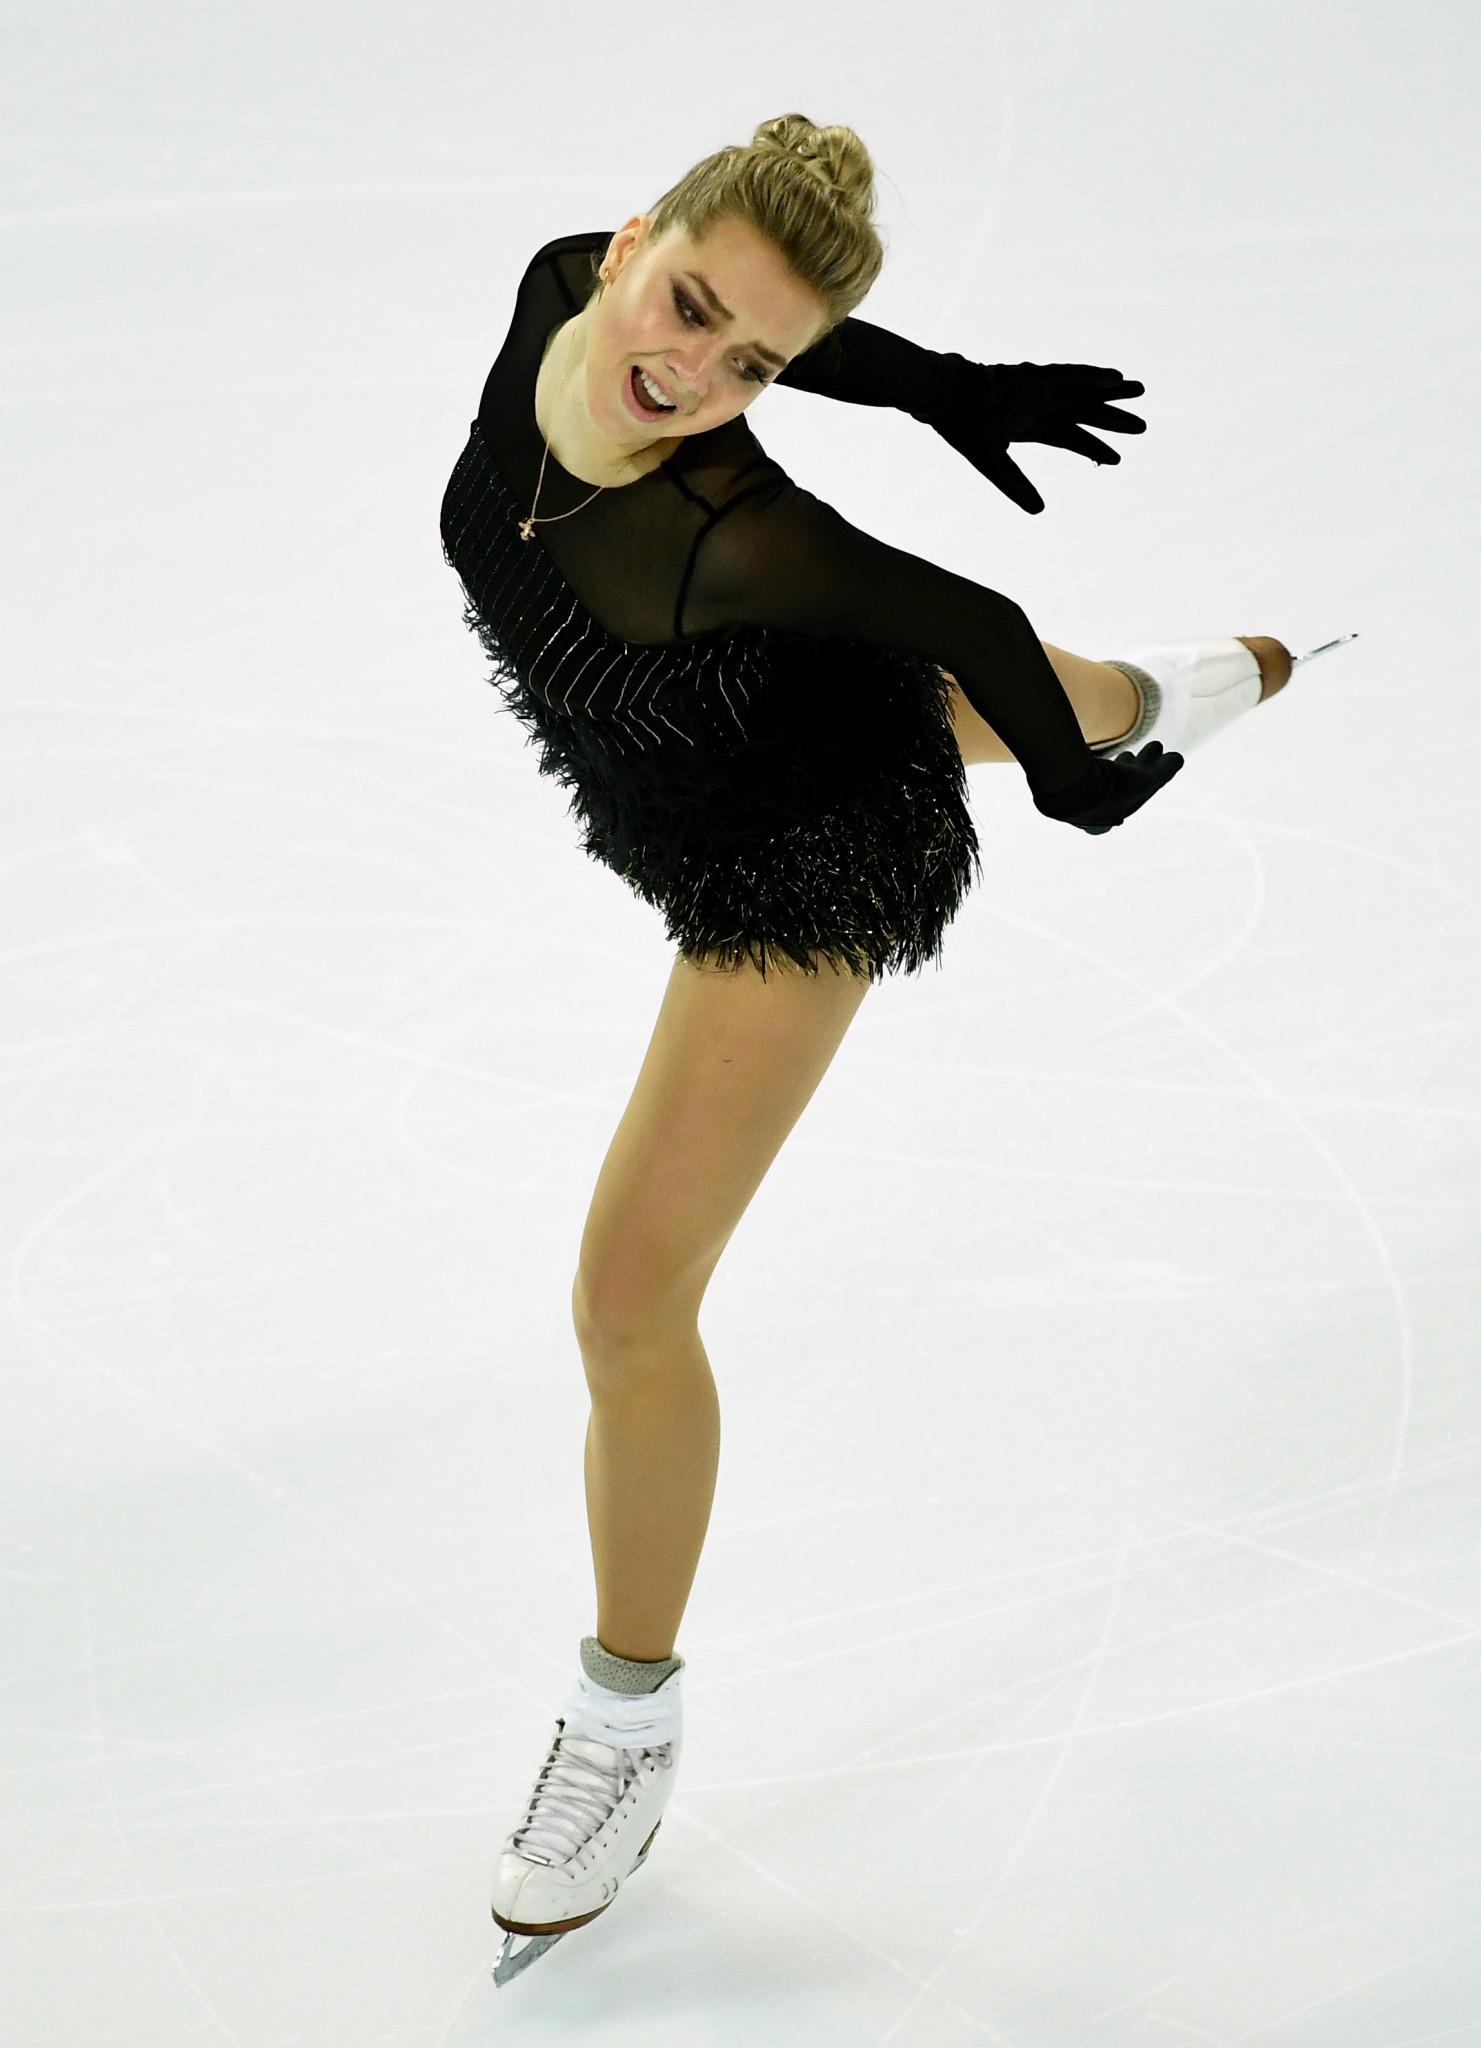 Russian figure skater Radionova retires aged 21